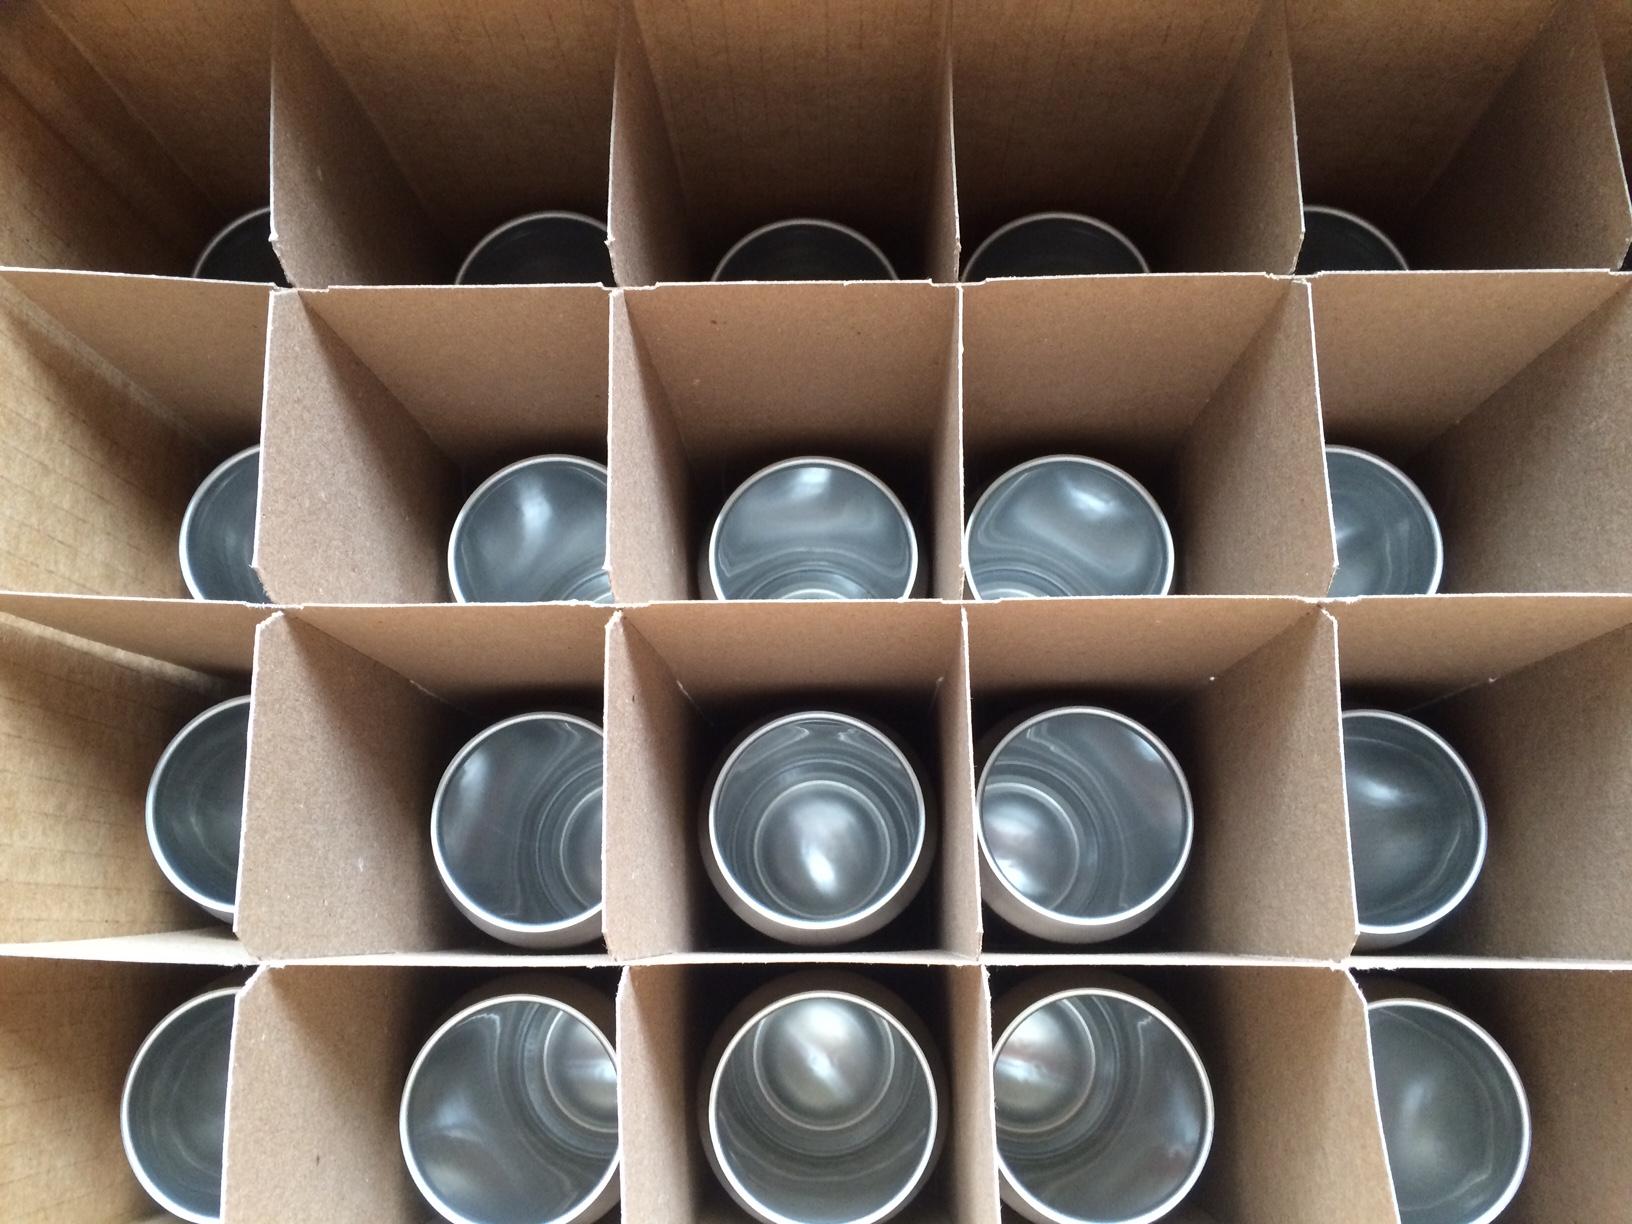 cans-ballcorp.JPG